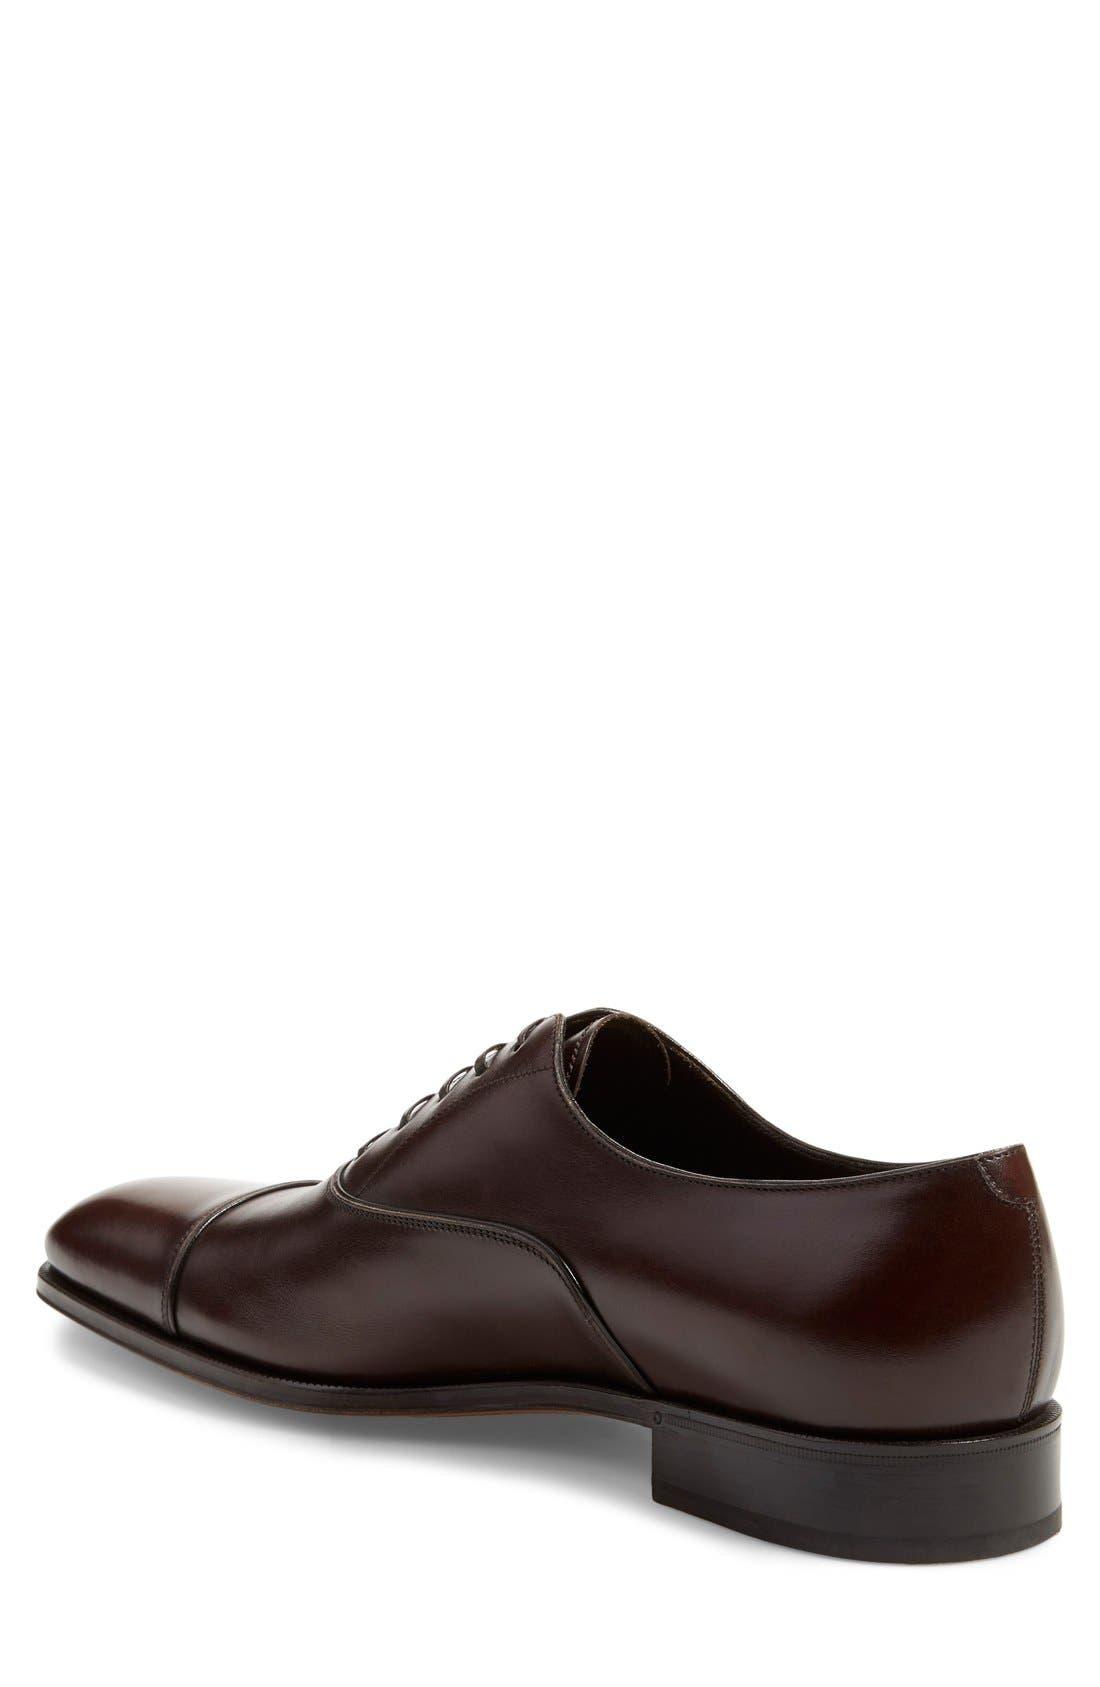 Luce Cap Toe Oxford,                             Alternate thumbnail 2, color,                             Auburn Leather